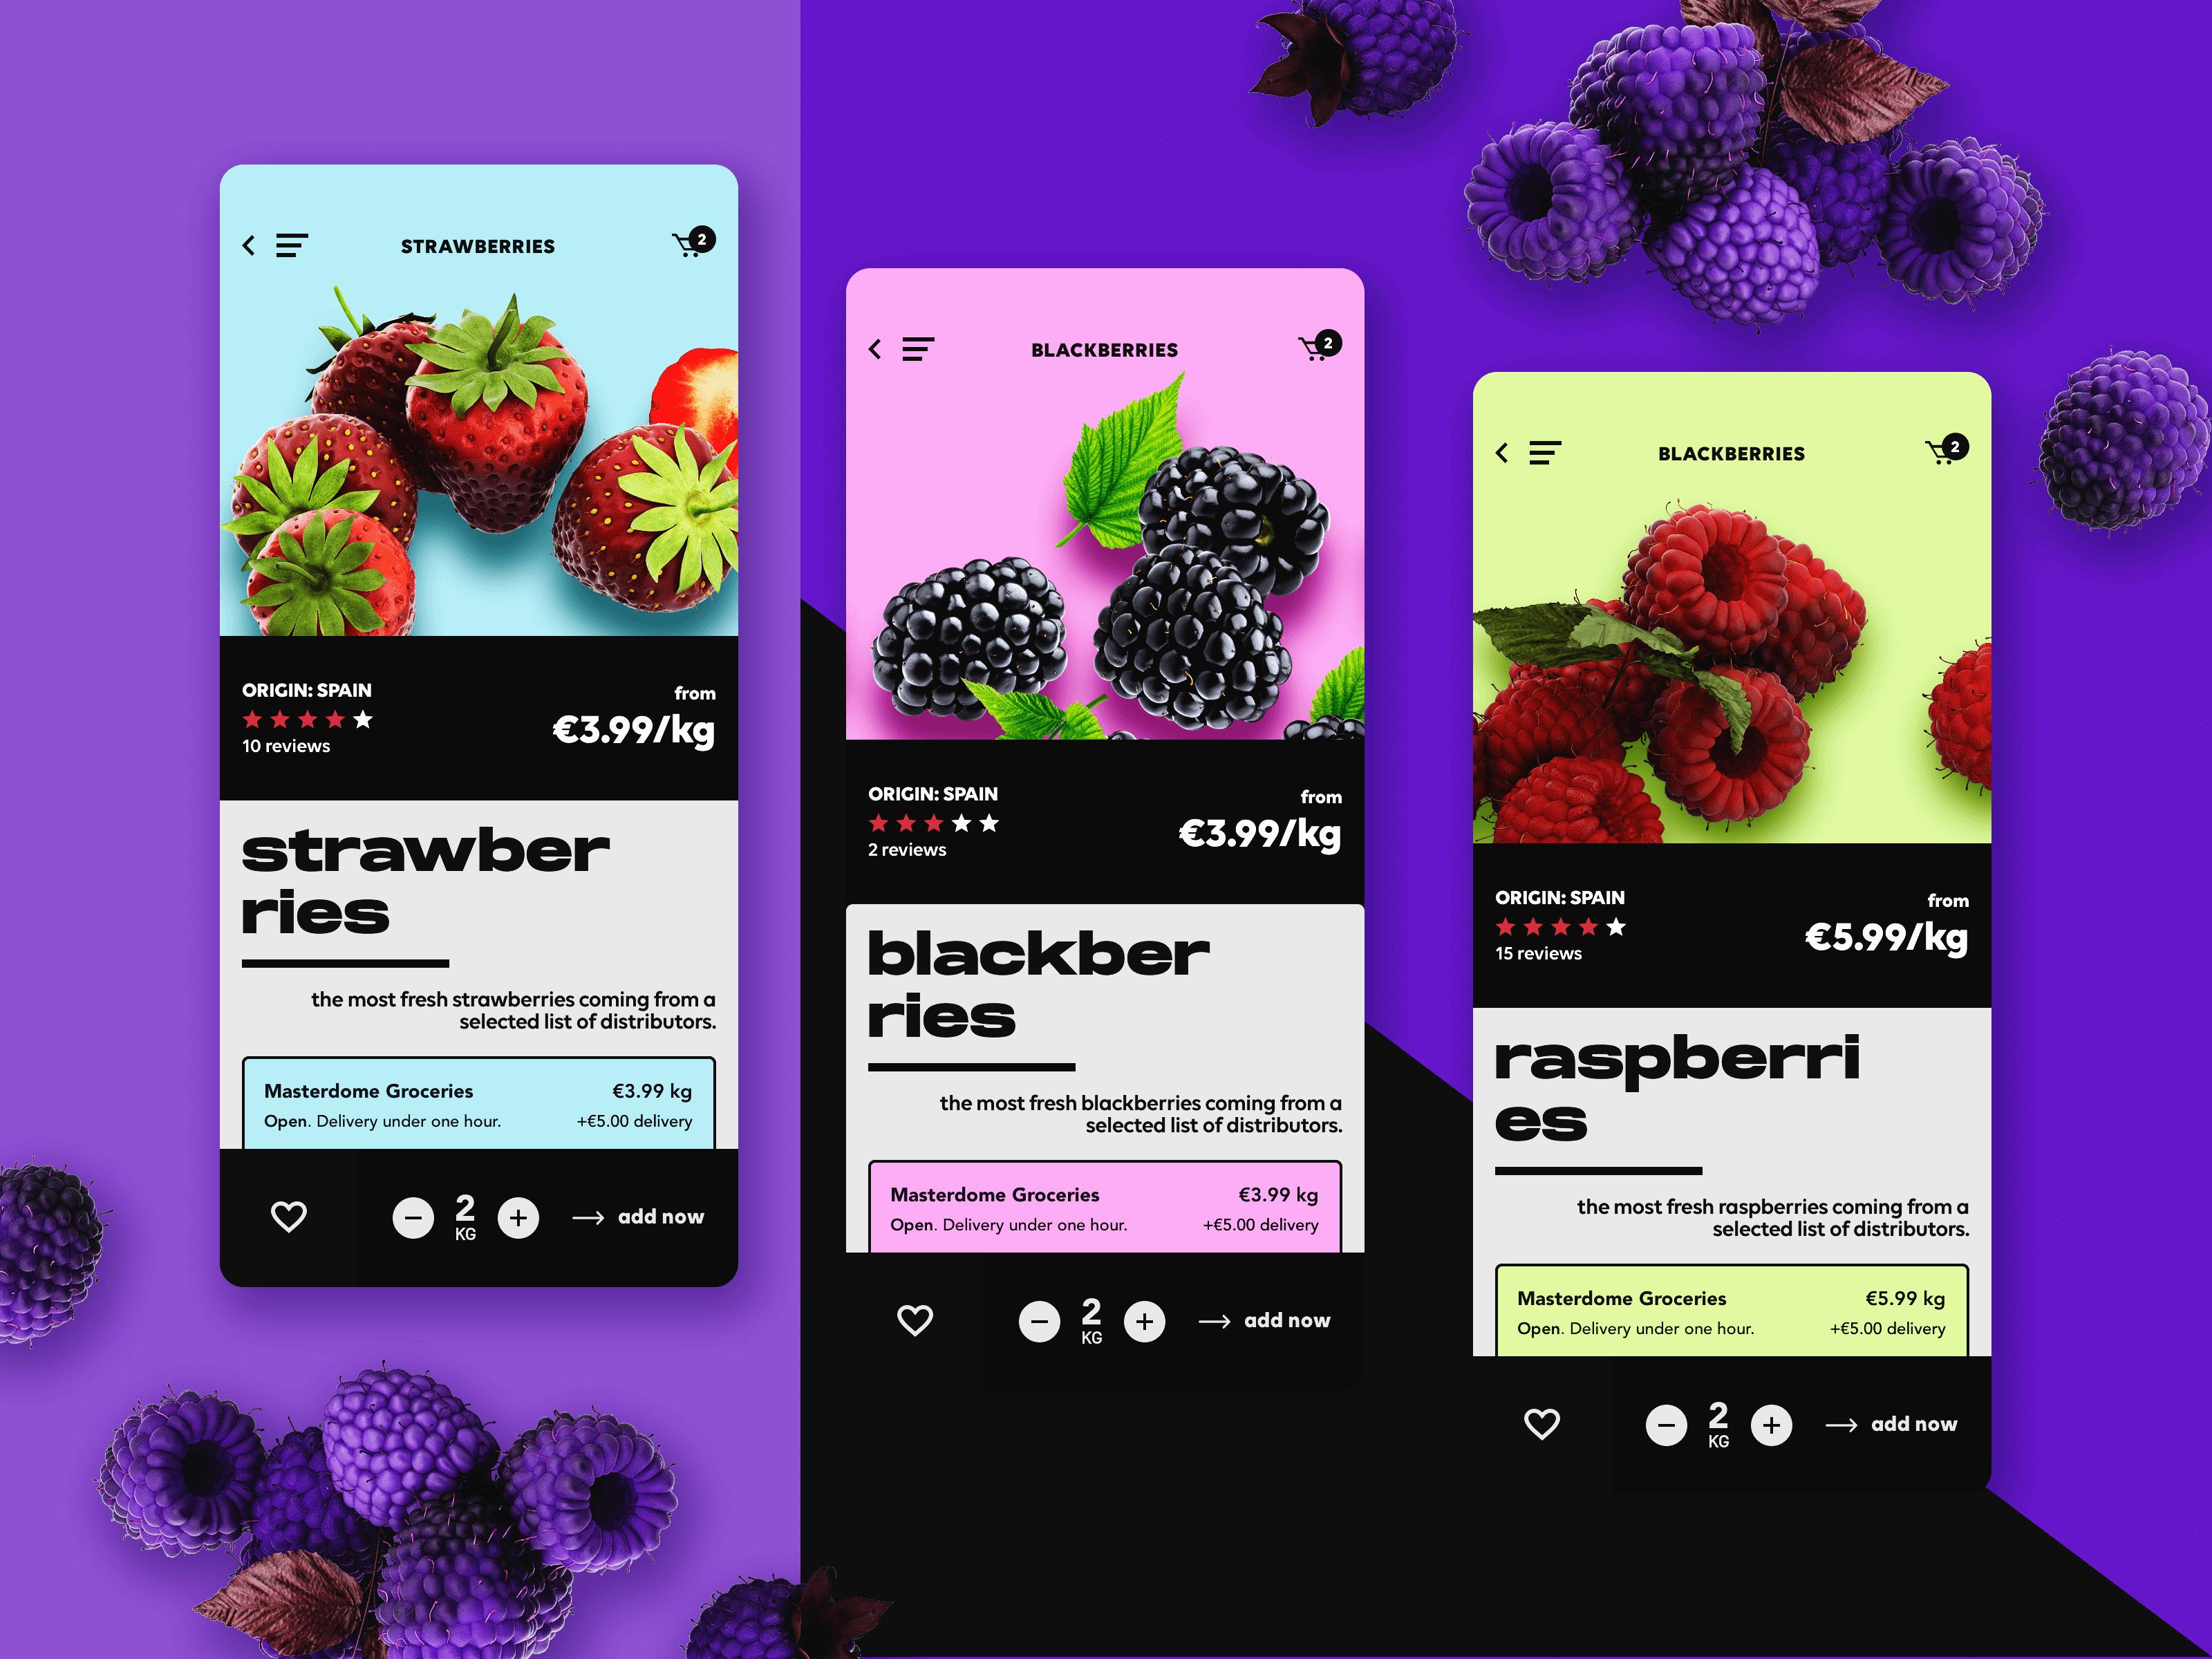 sooioo-groceries-marketplace-iOS-app-design-2-1